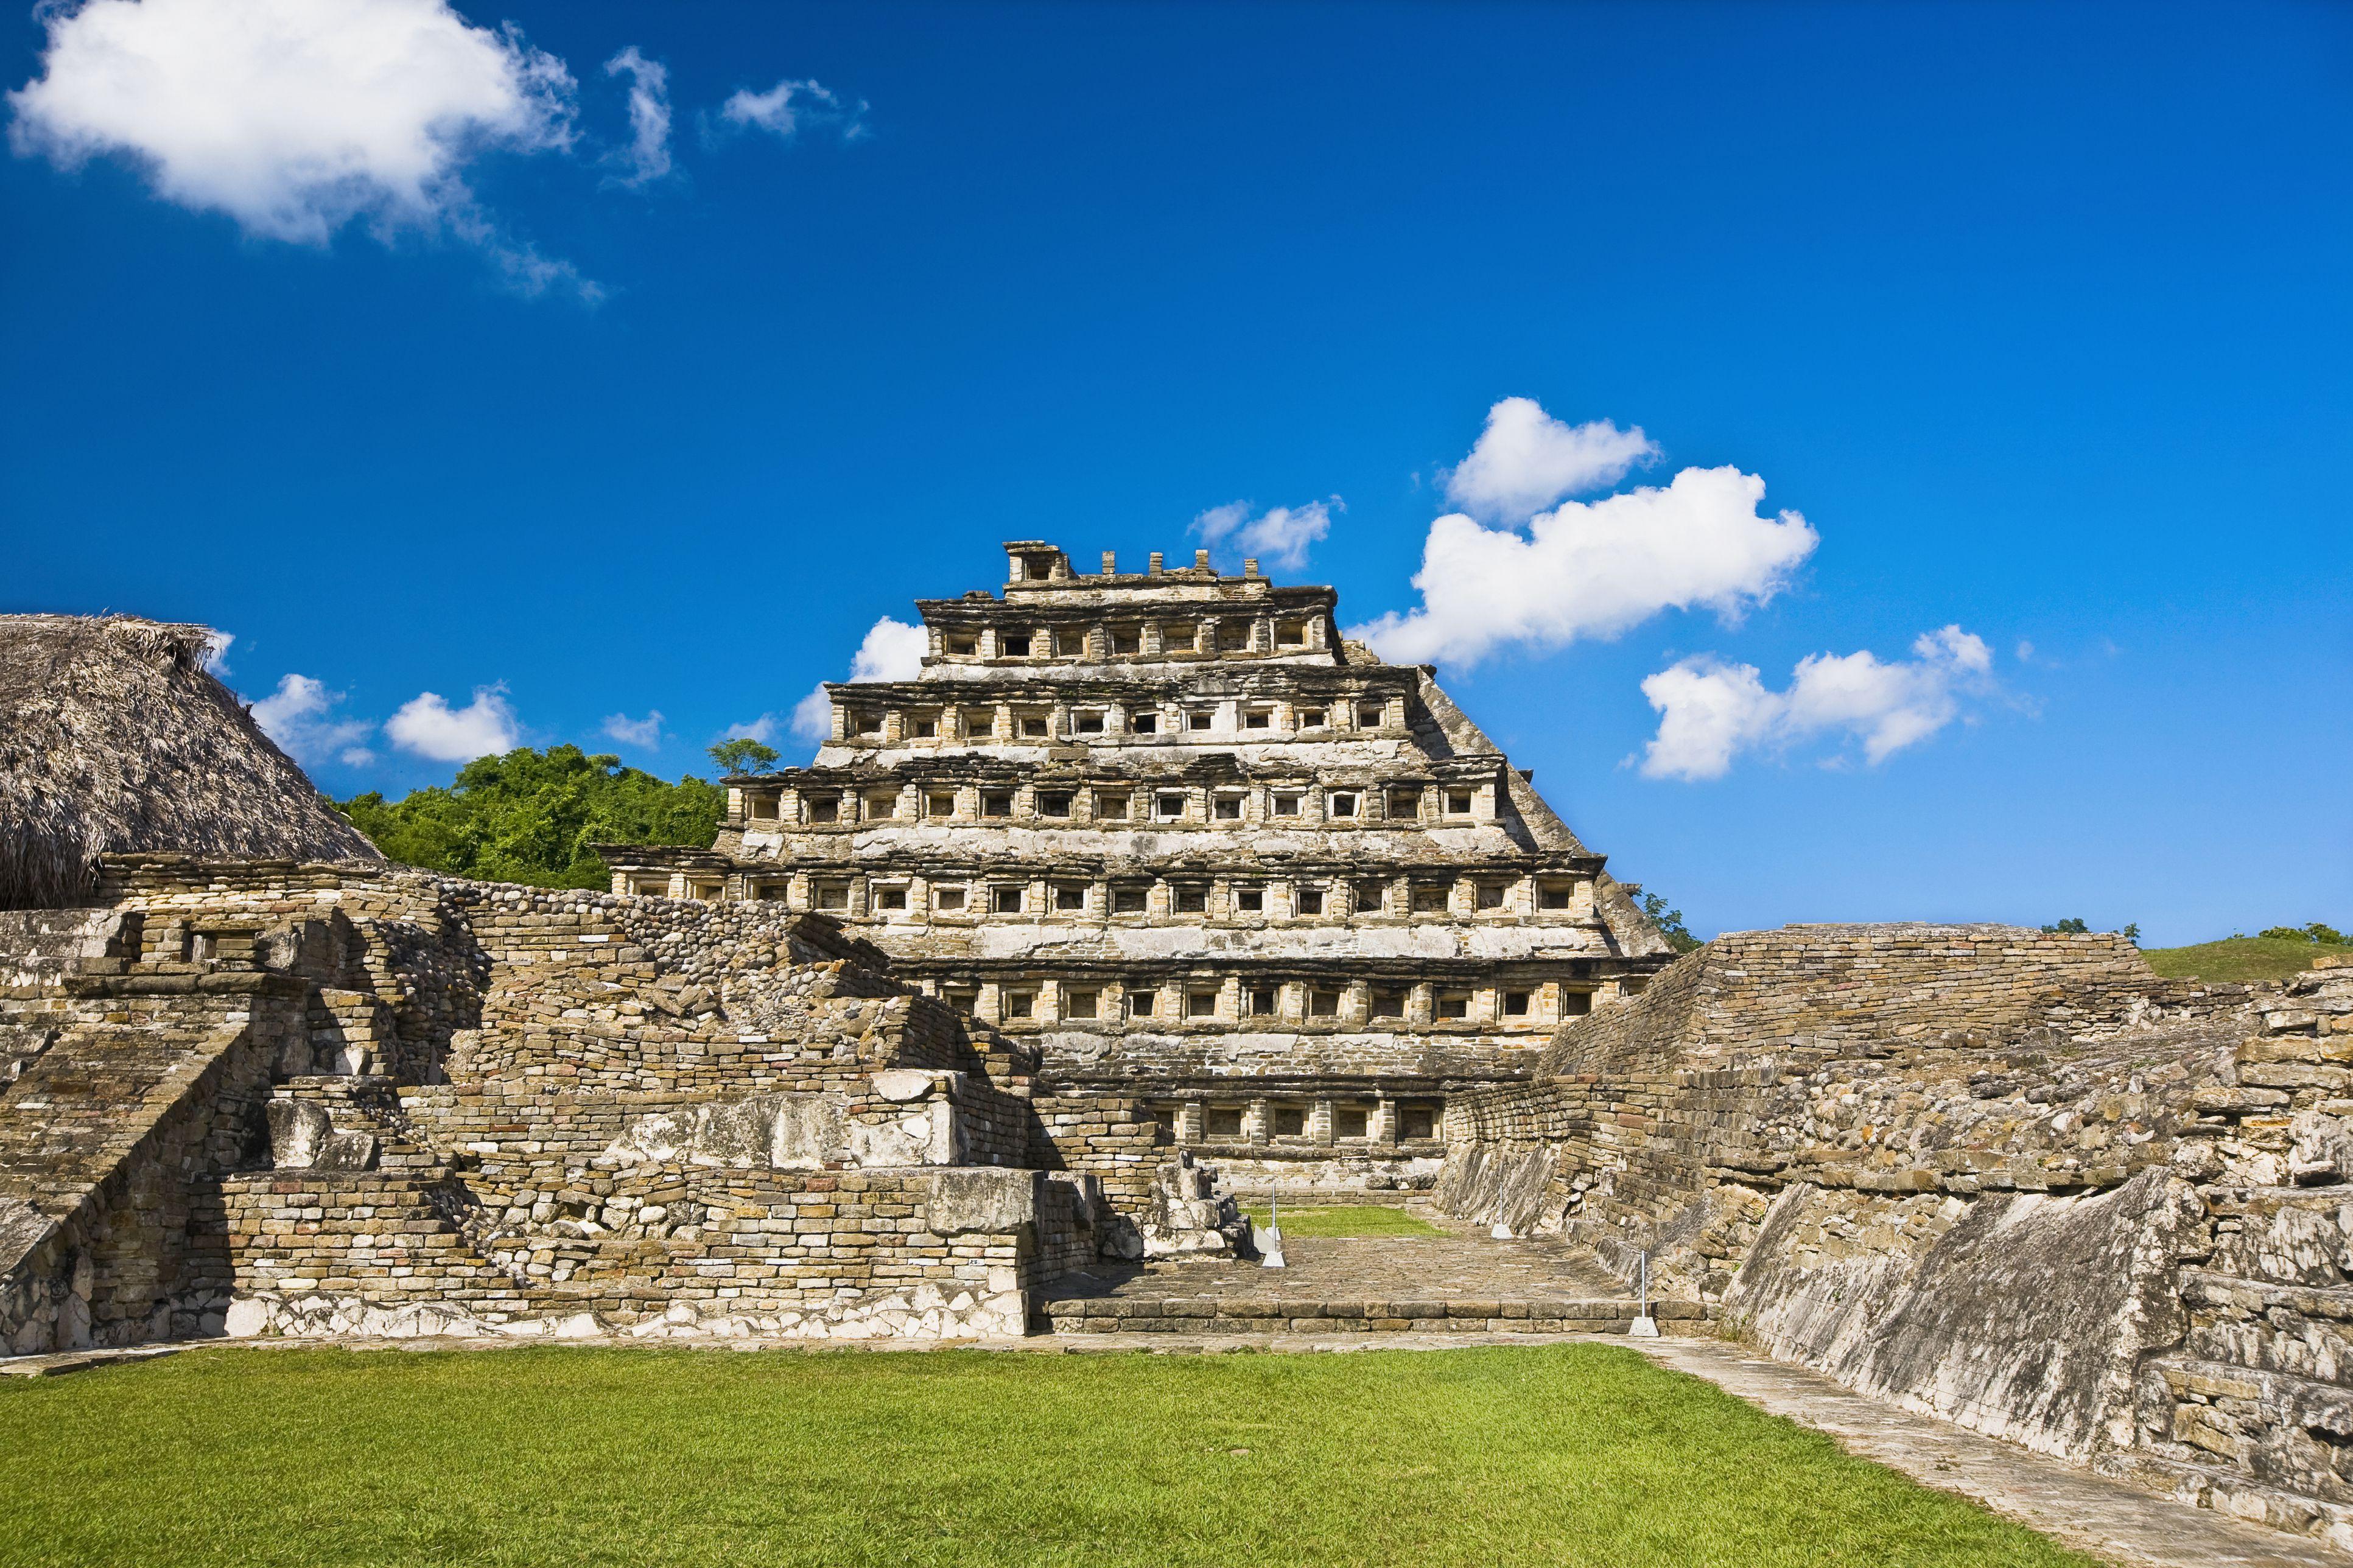 Pyramid on a landscape, Pyramid Of The Niches, El Tajin, Veracruz, Mexico